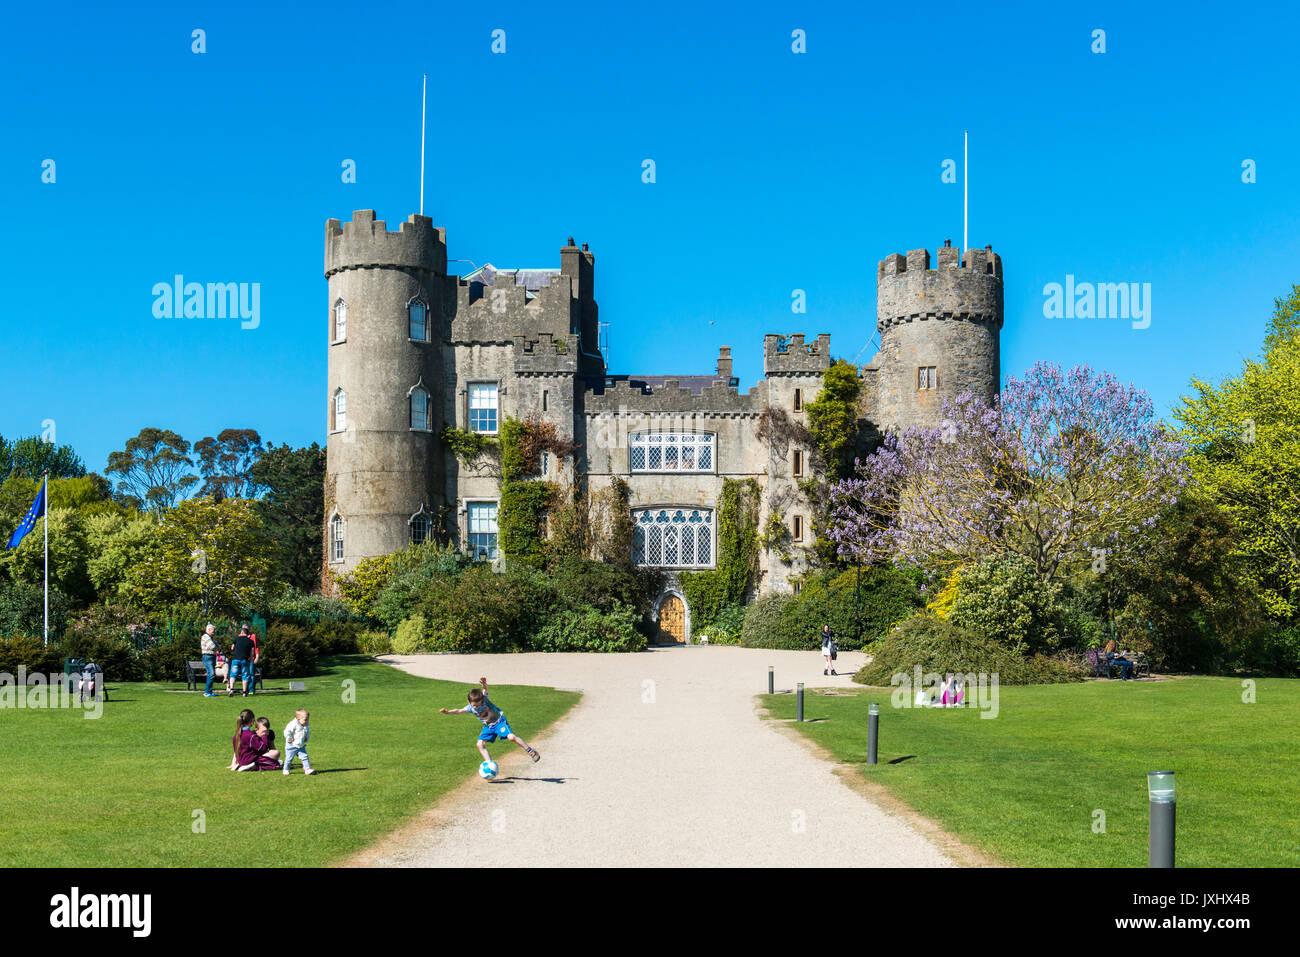 Malahide Castle and Gardens, Dublin, Ireland - Stock Image